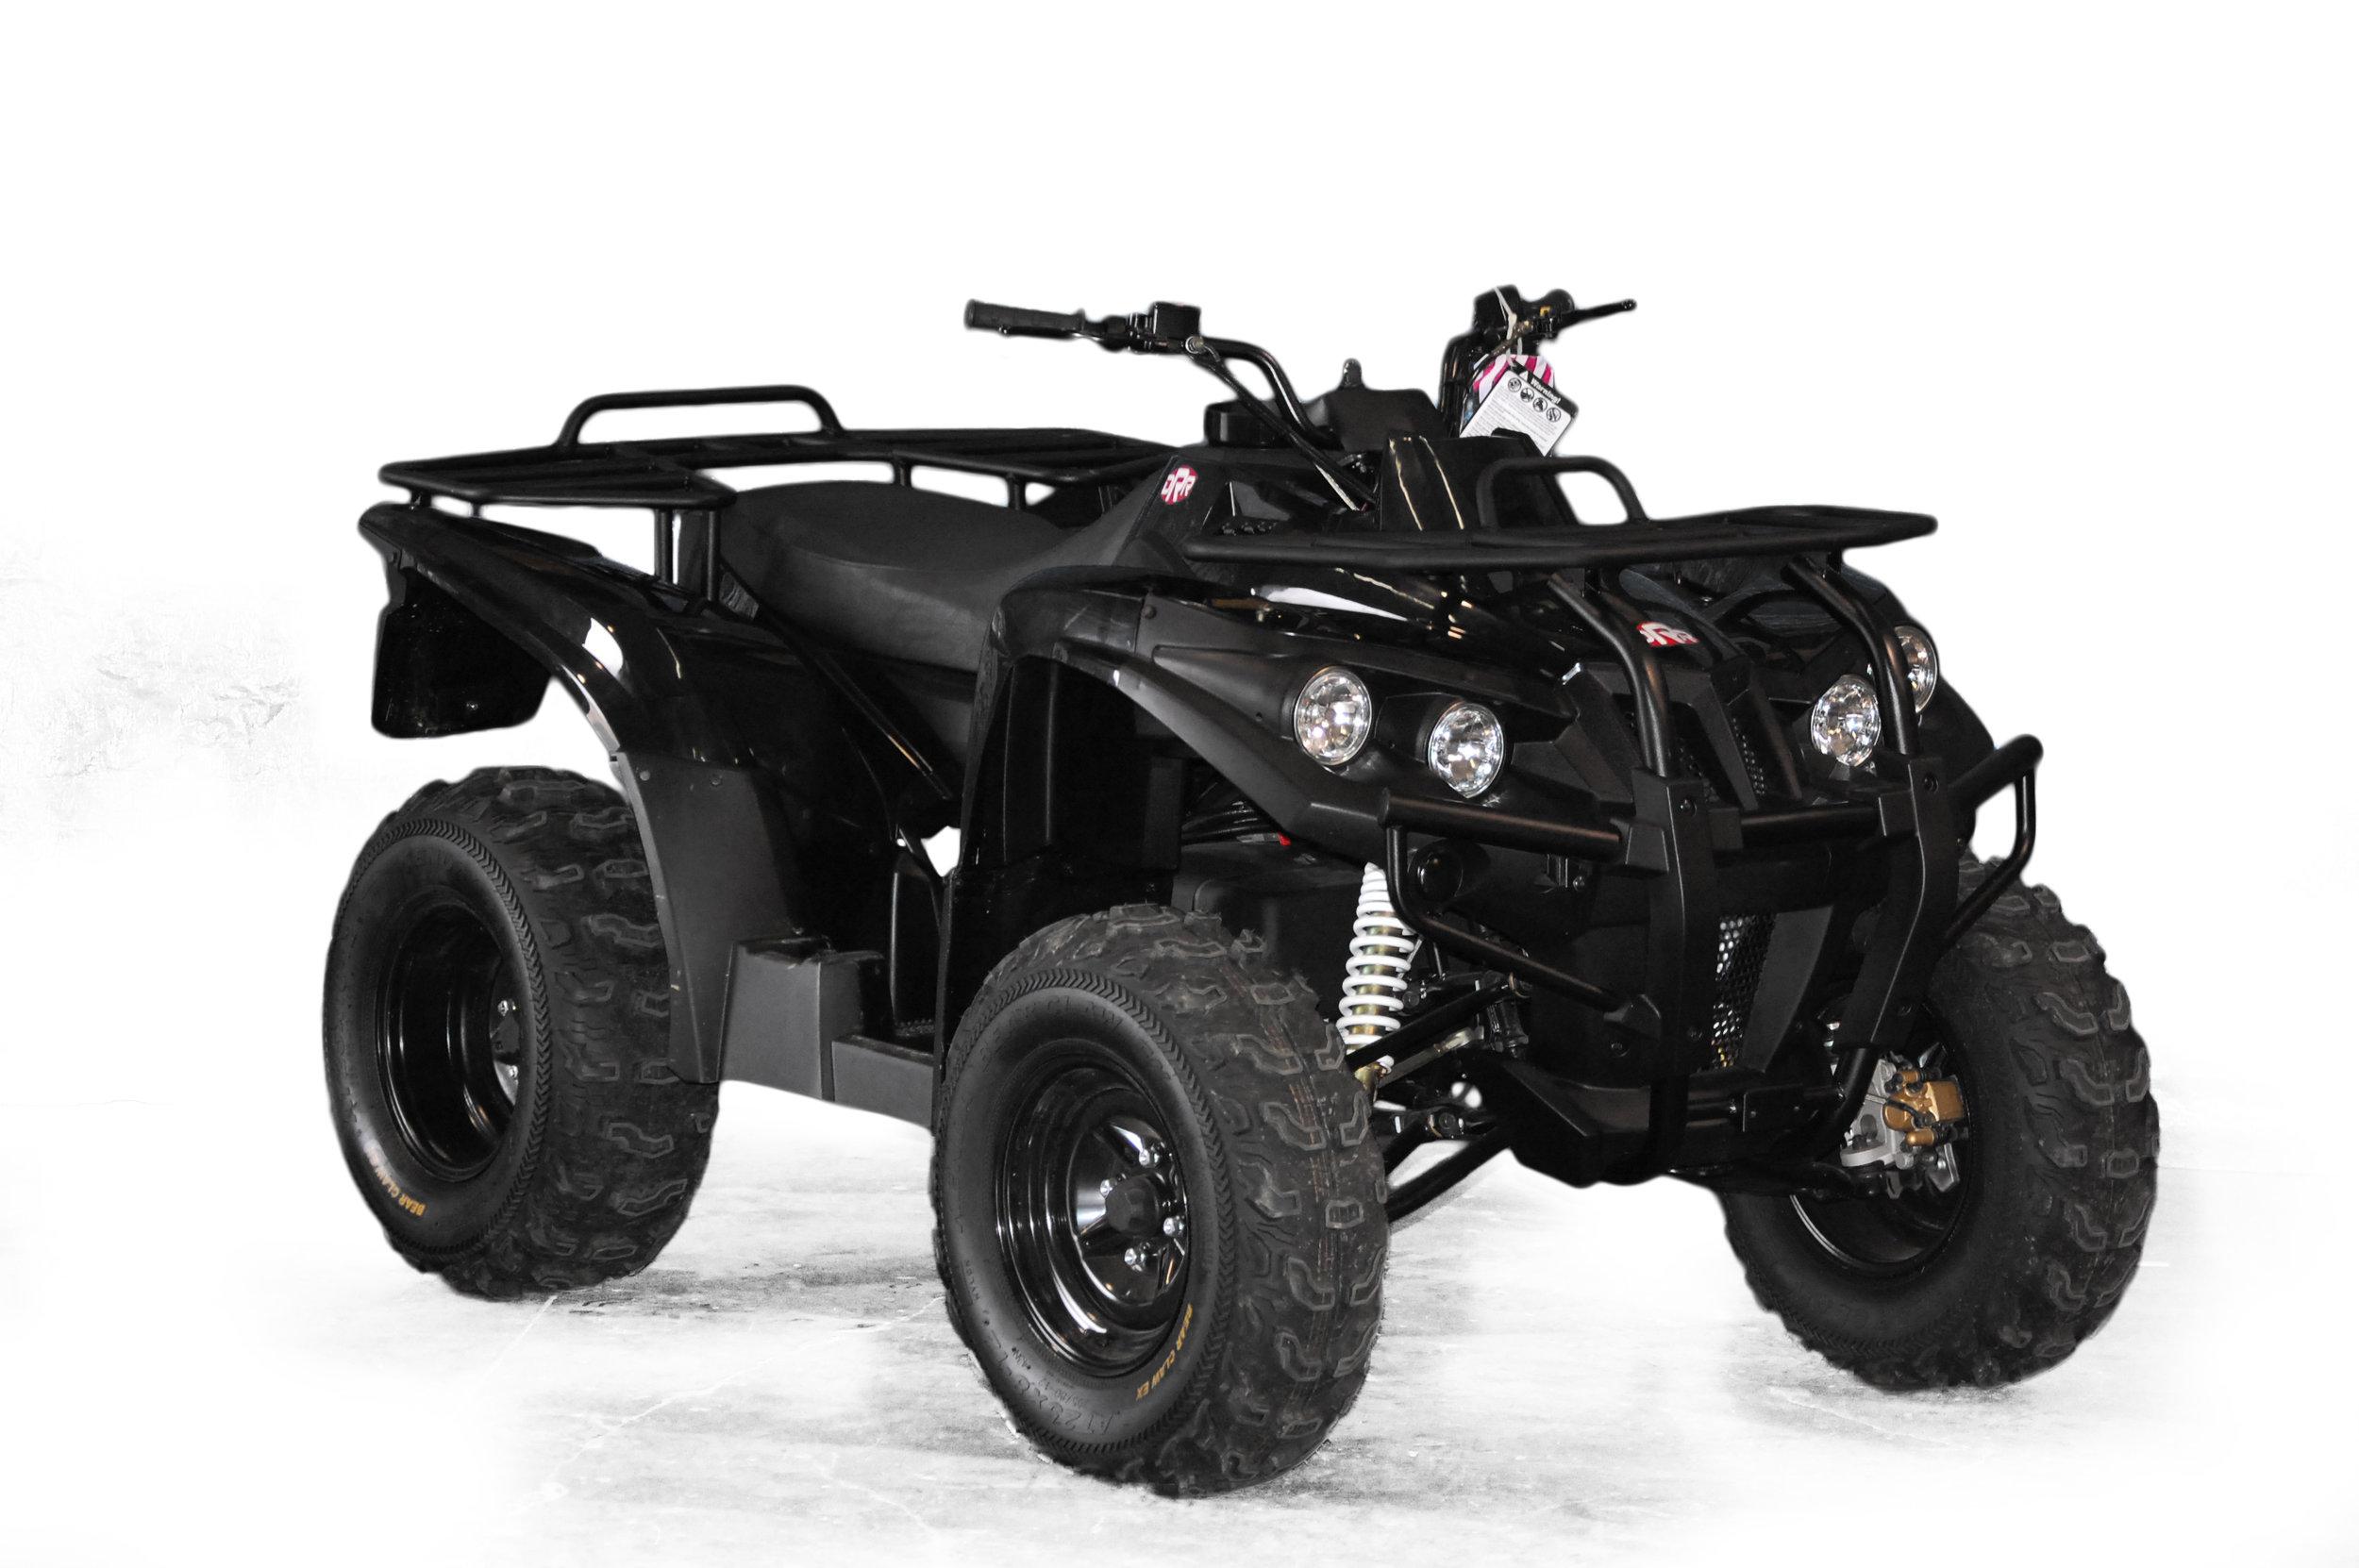 DRR Electric ATV Angled view.jpg